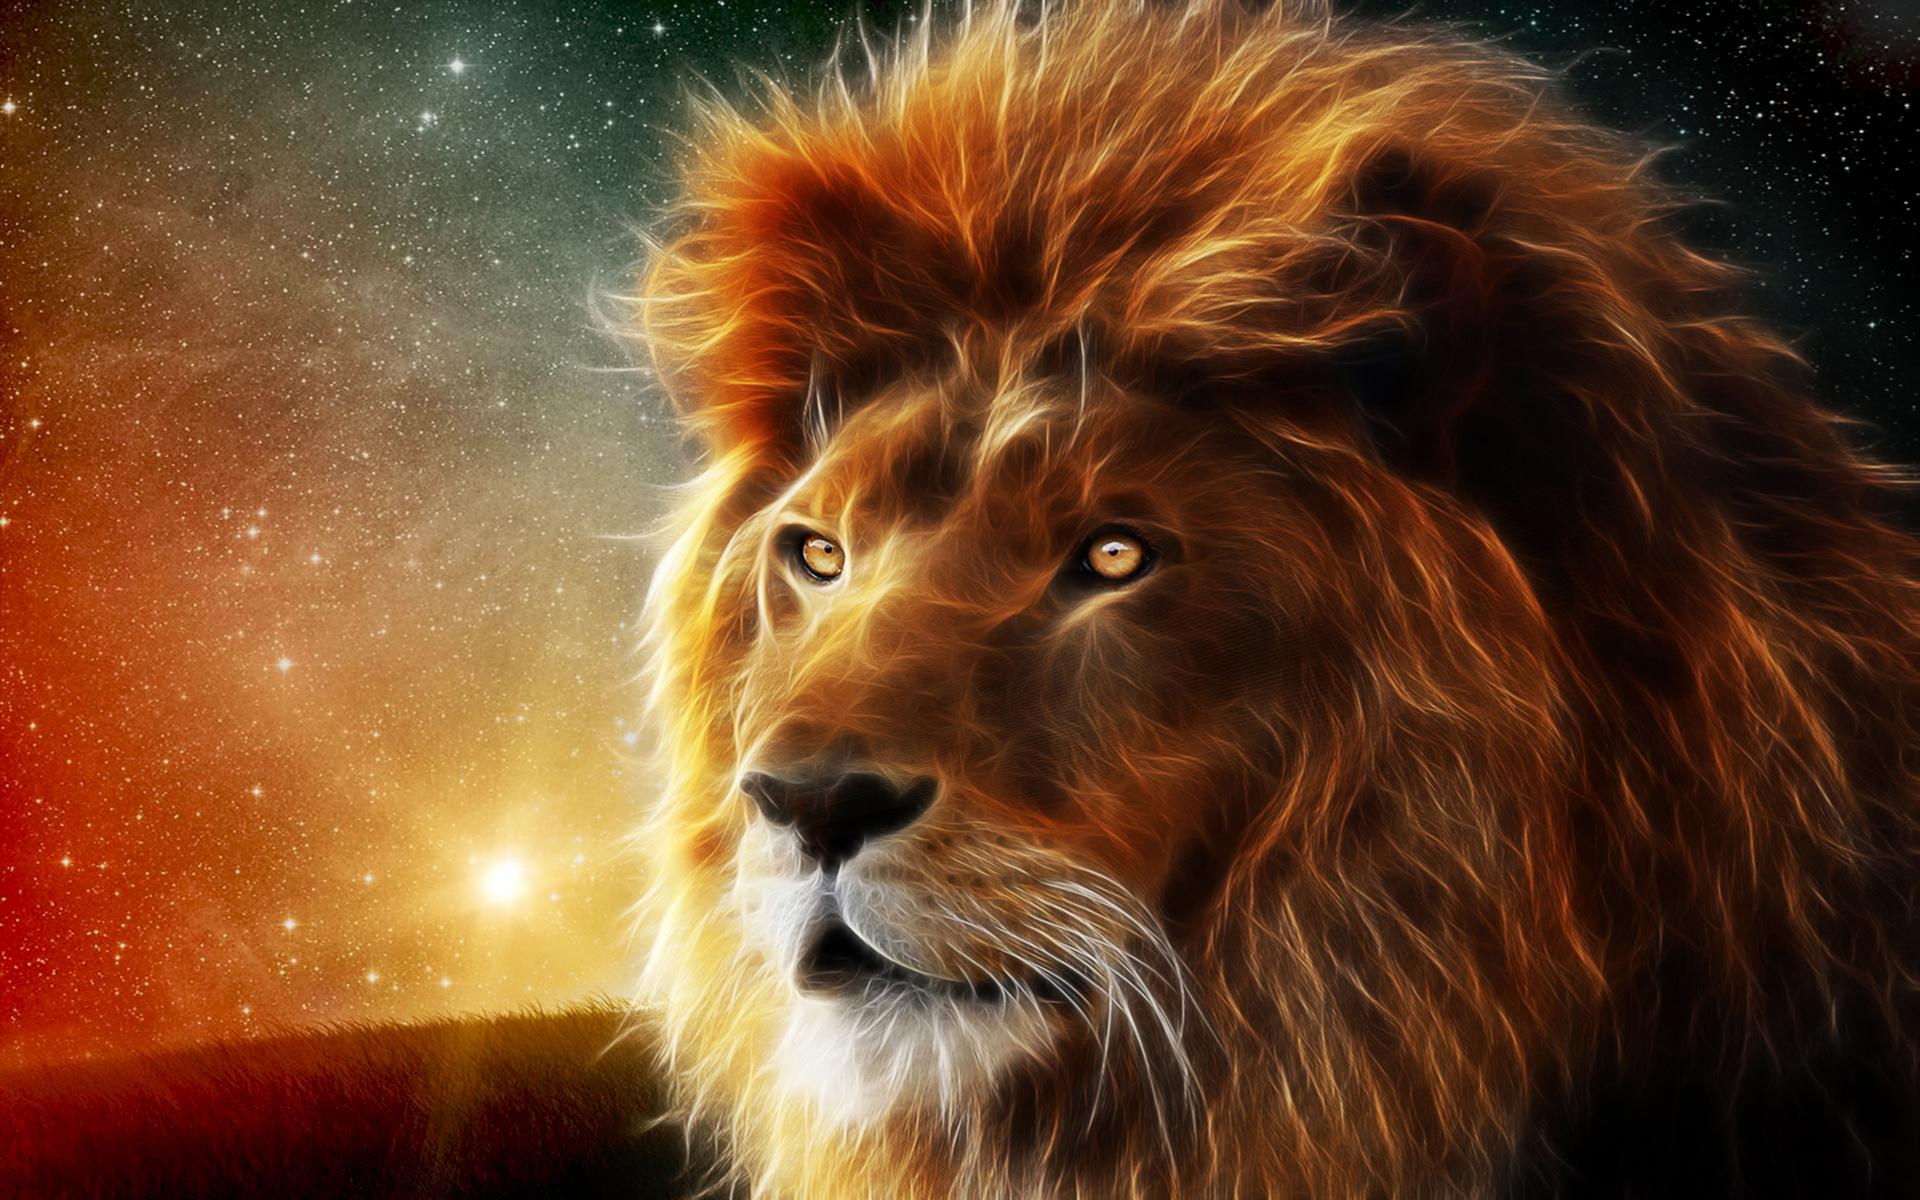 1920 x 1200 - 1013k - jpg 8868 Lion Wallpaper Hd ...